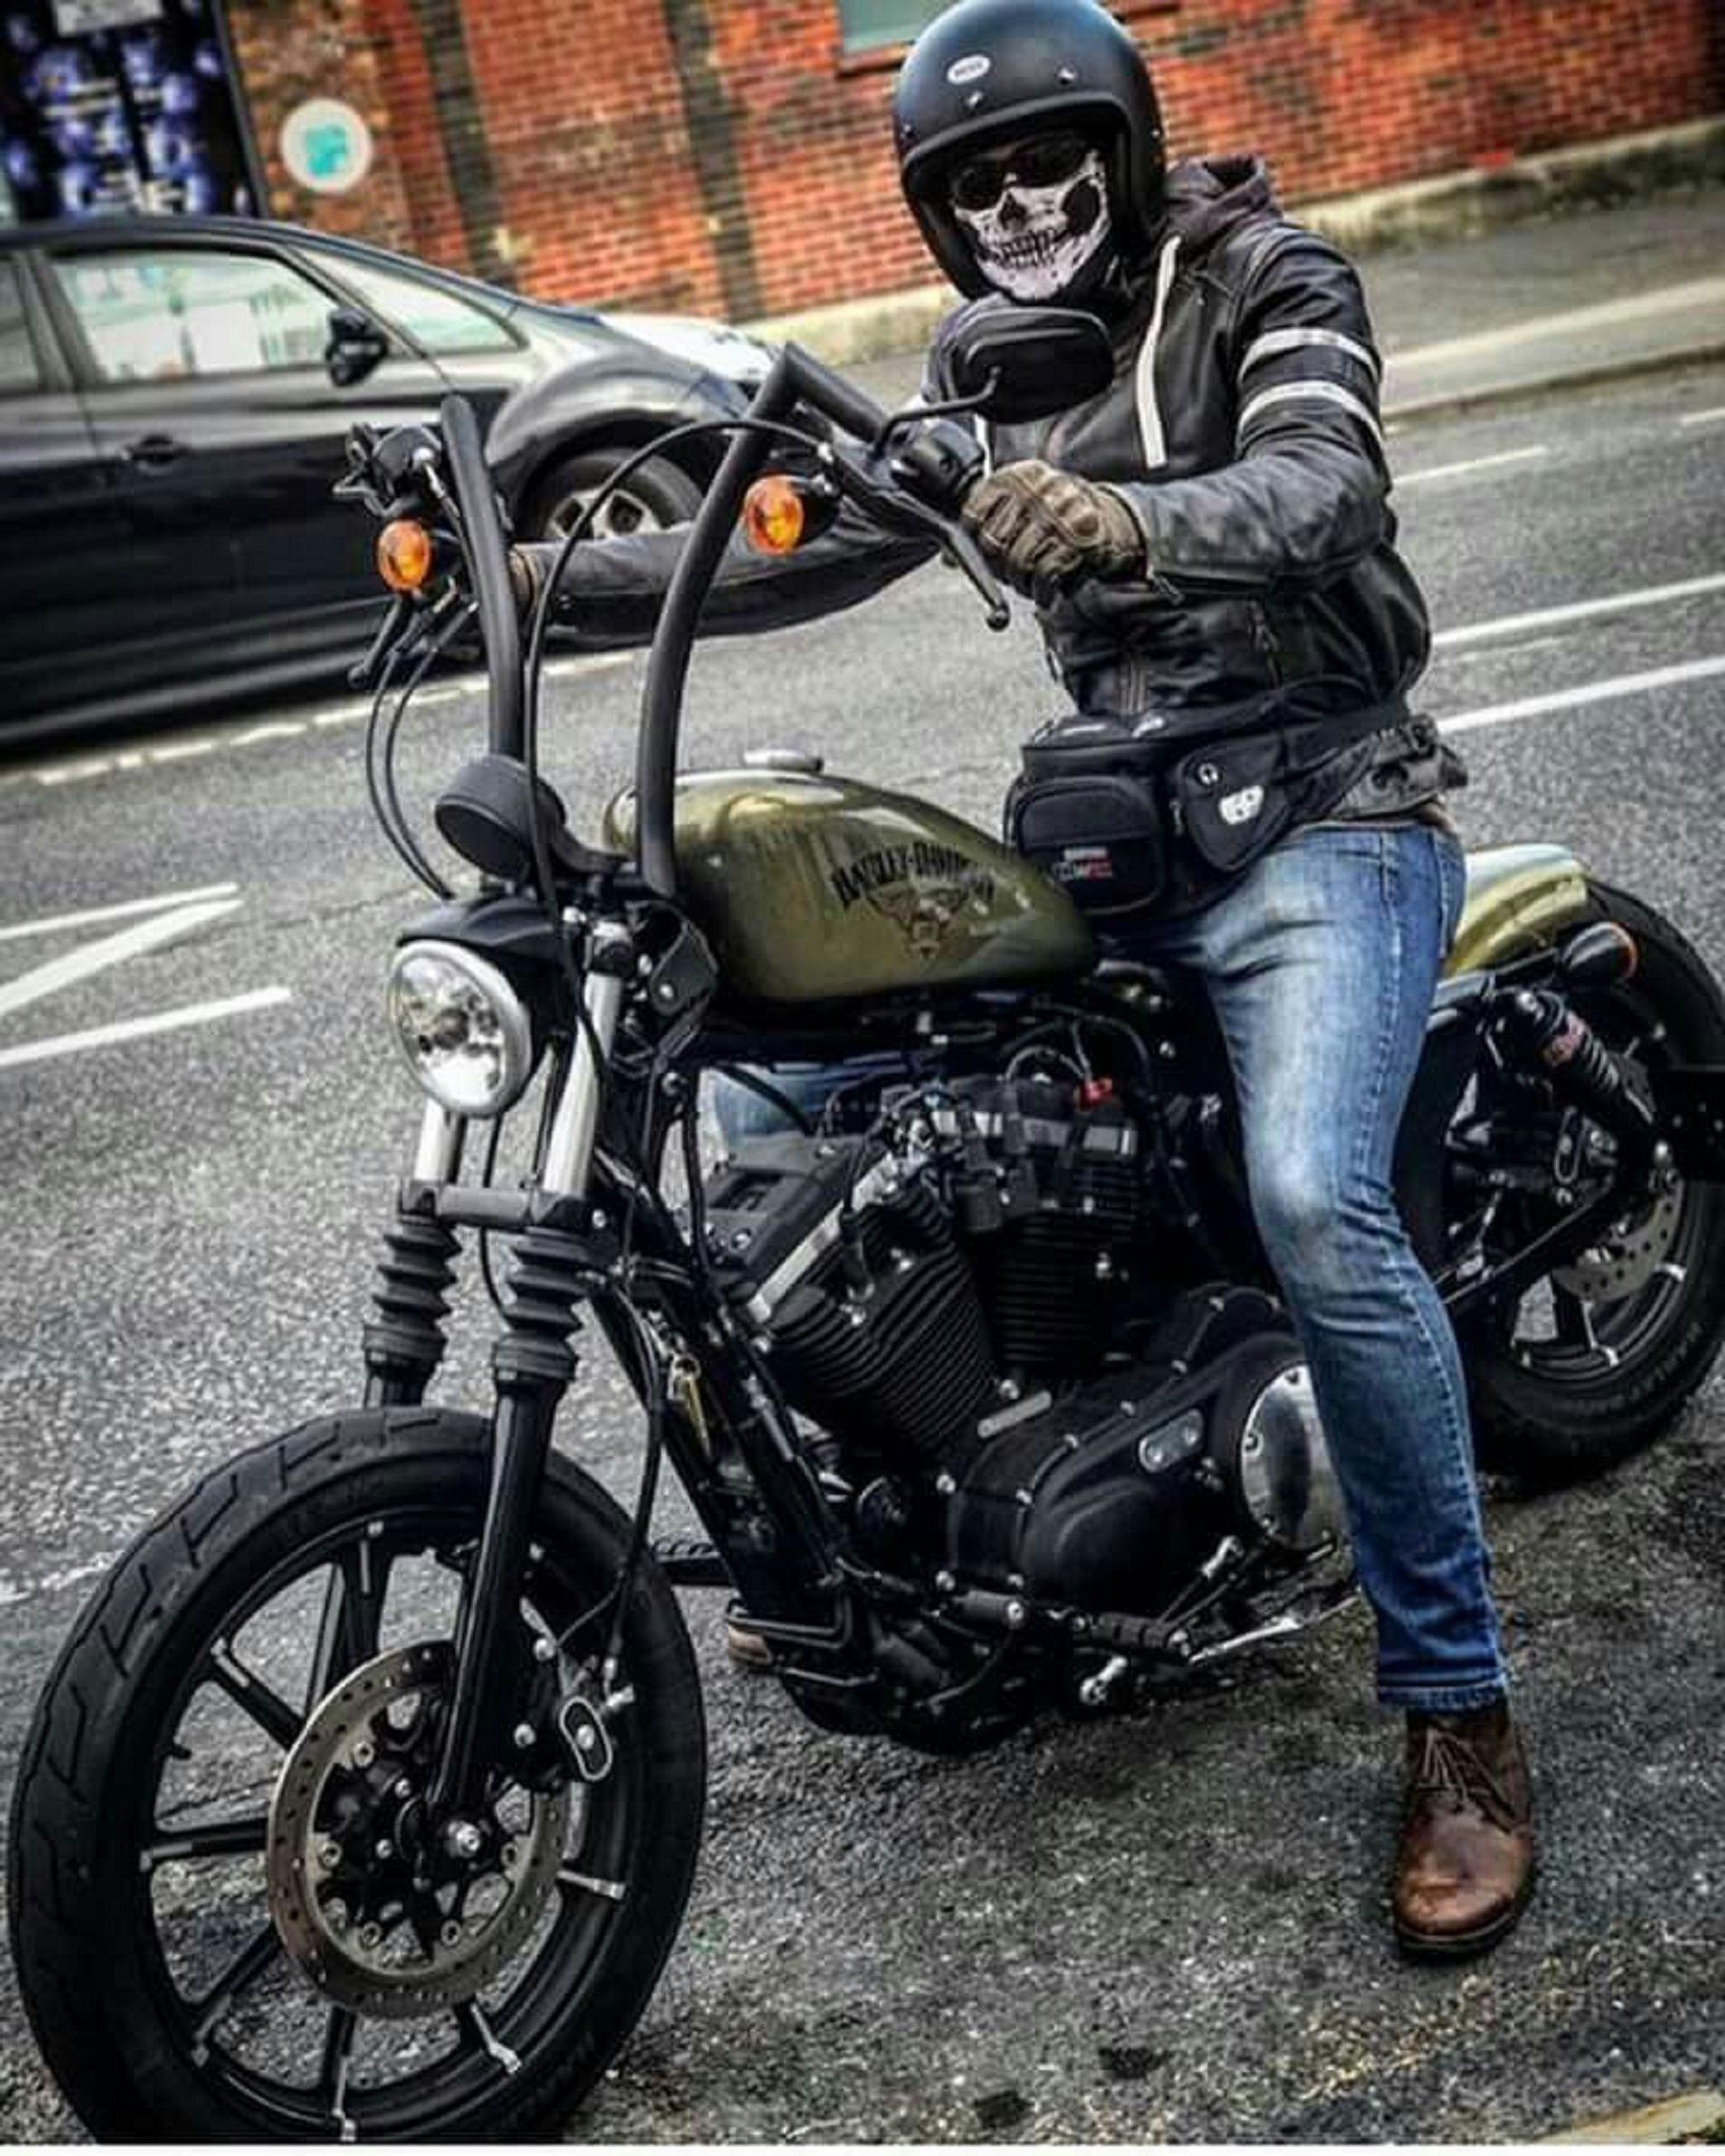 Harley Davidson Iron 883 Http Harley Davidson Com Gb En Motorcycles 2018 Sportster Iron 883 Html Motos Bober Motos Geniales Motos Antiguas